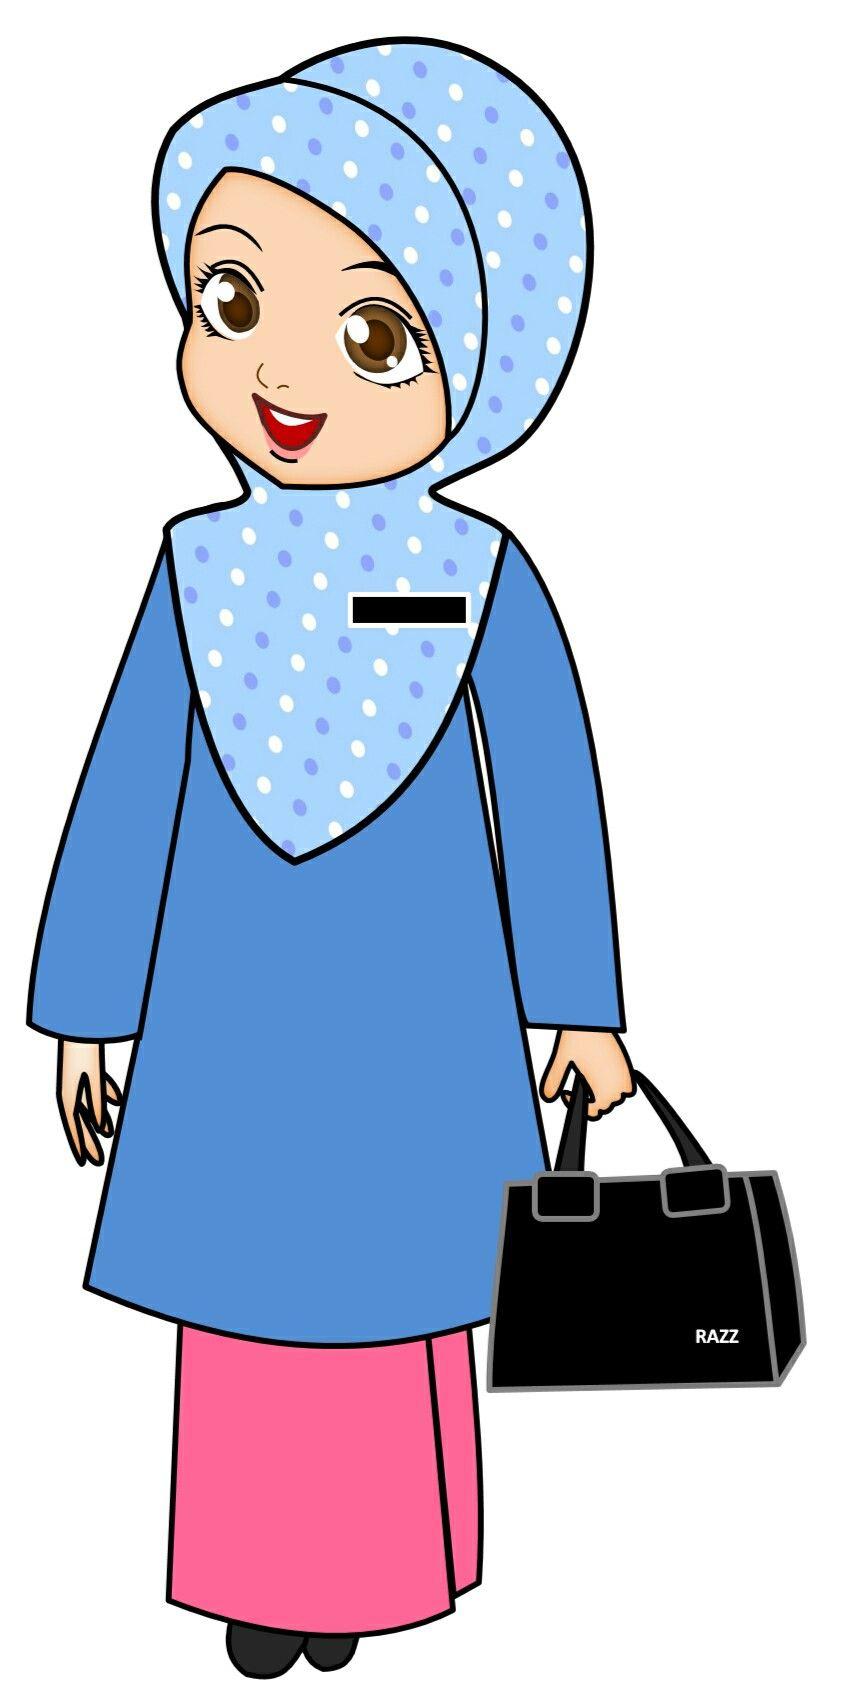 Gambar Kartun Guru : gambar, kartun, Doodle, Ideas, Muslim, Kids,, Hijab, Cartoon,, Anime